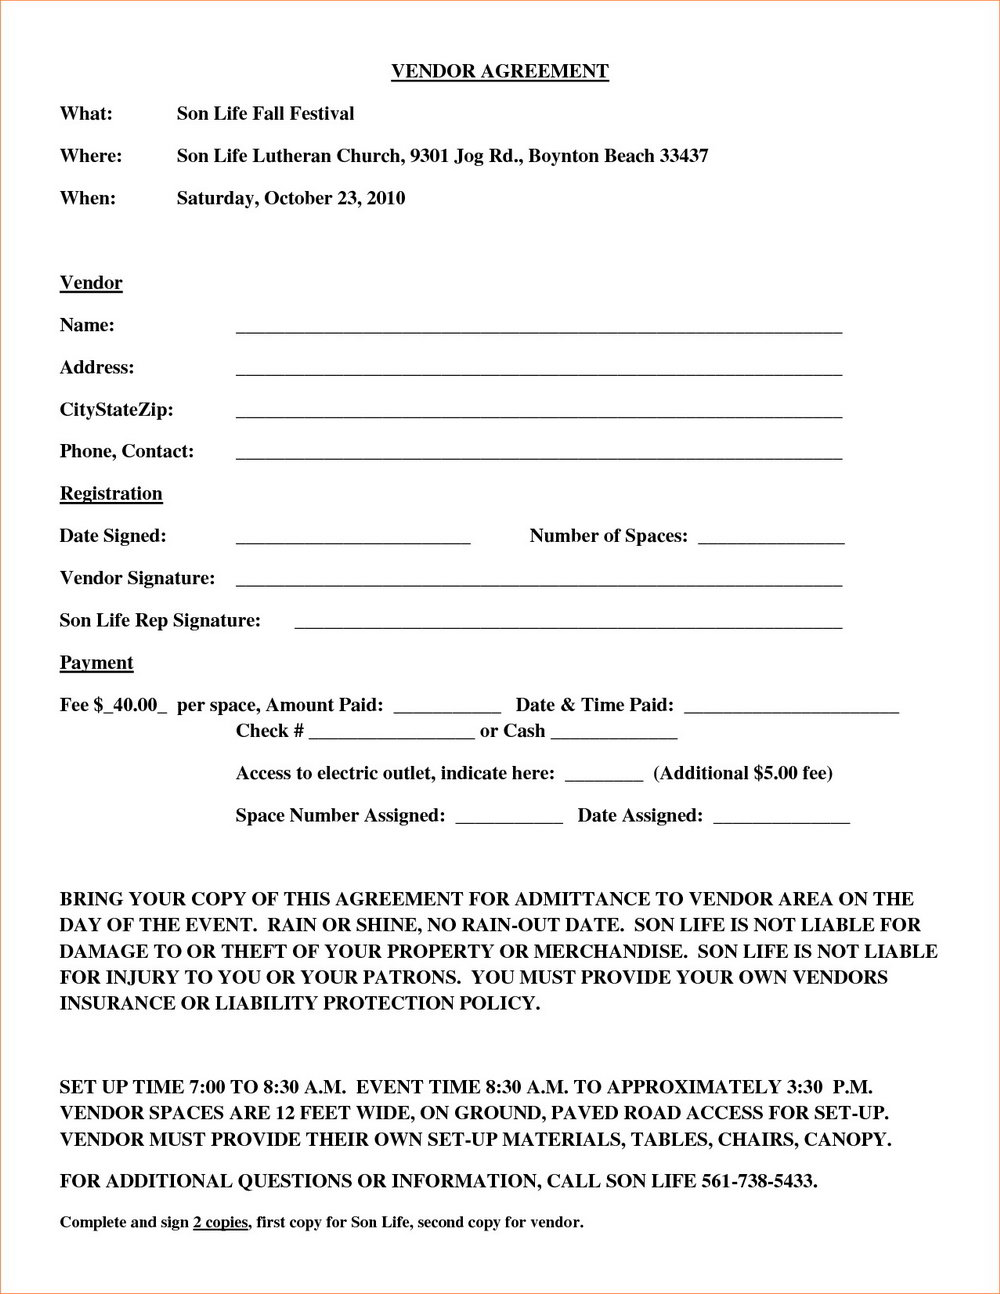 Event Vendor Agreement Template